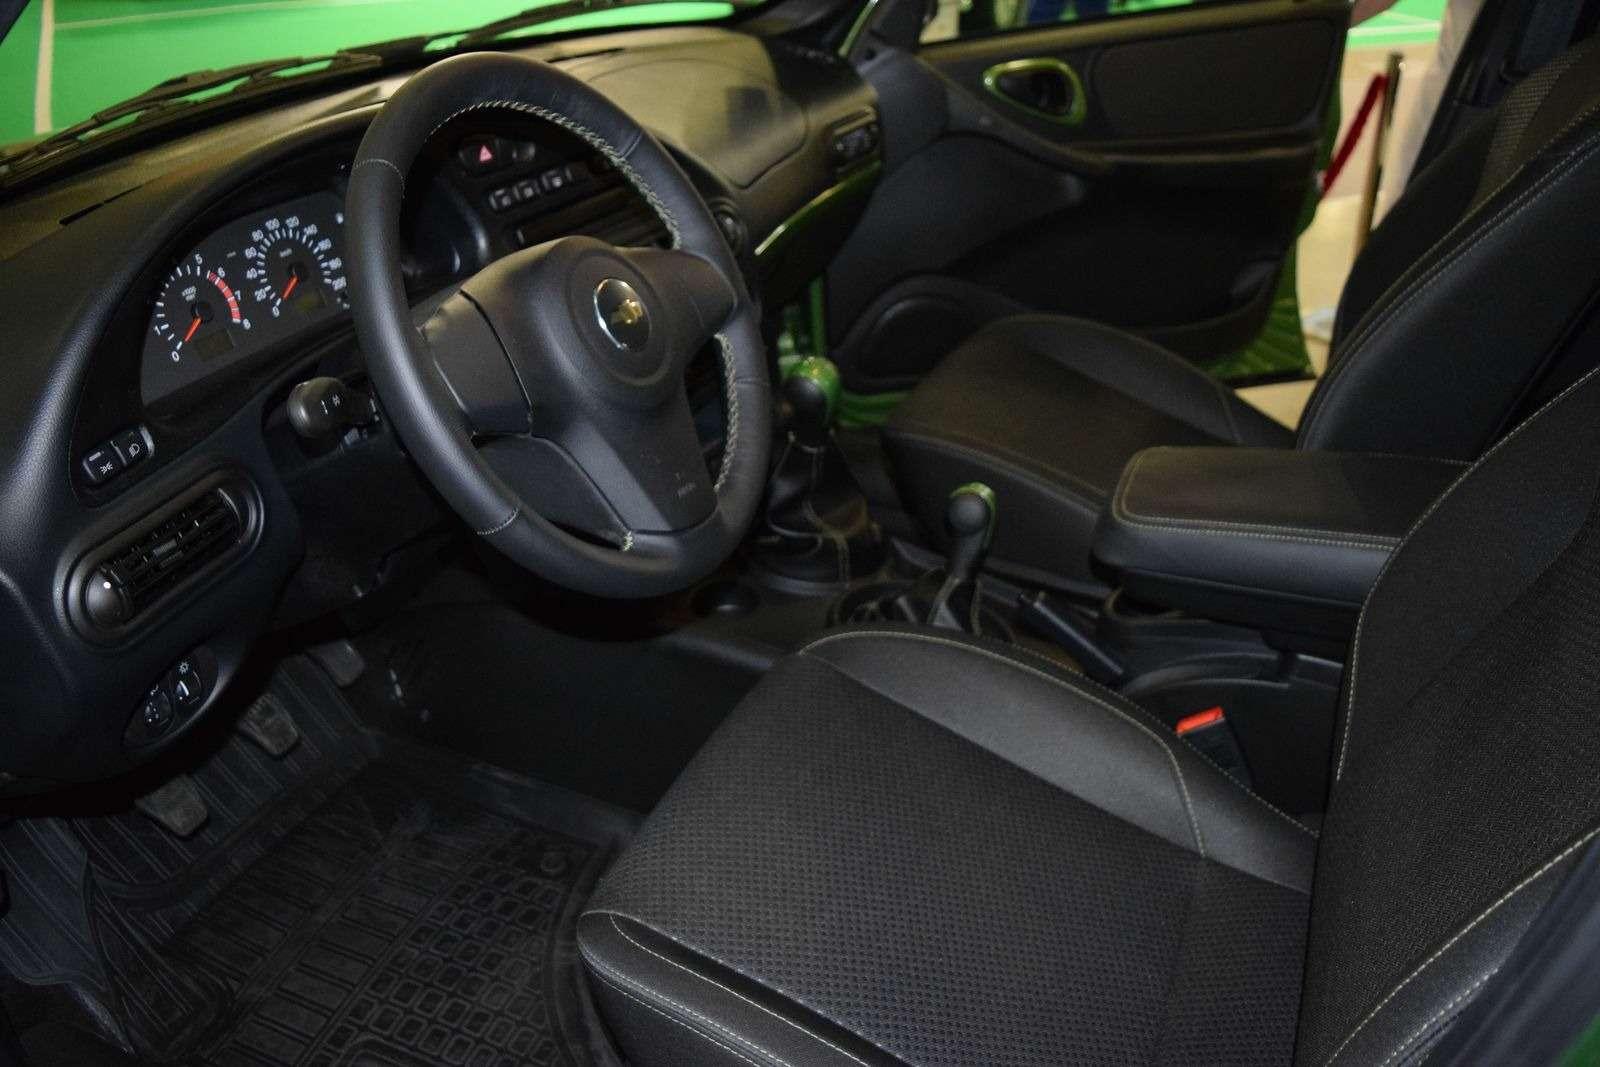 GM-АВТОВАЗ подогреет интерес кChevrolet Niva новыми спецверсиями— фото 387445